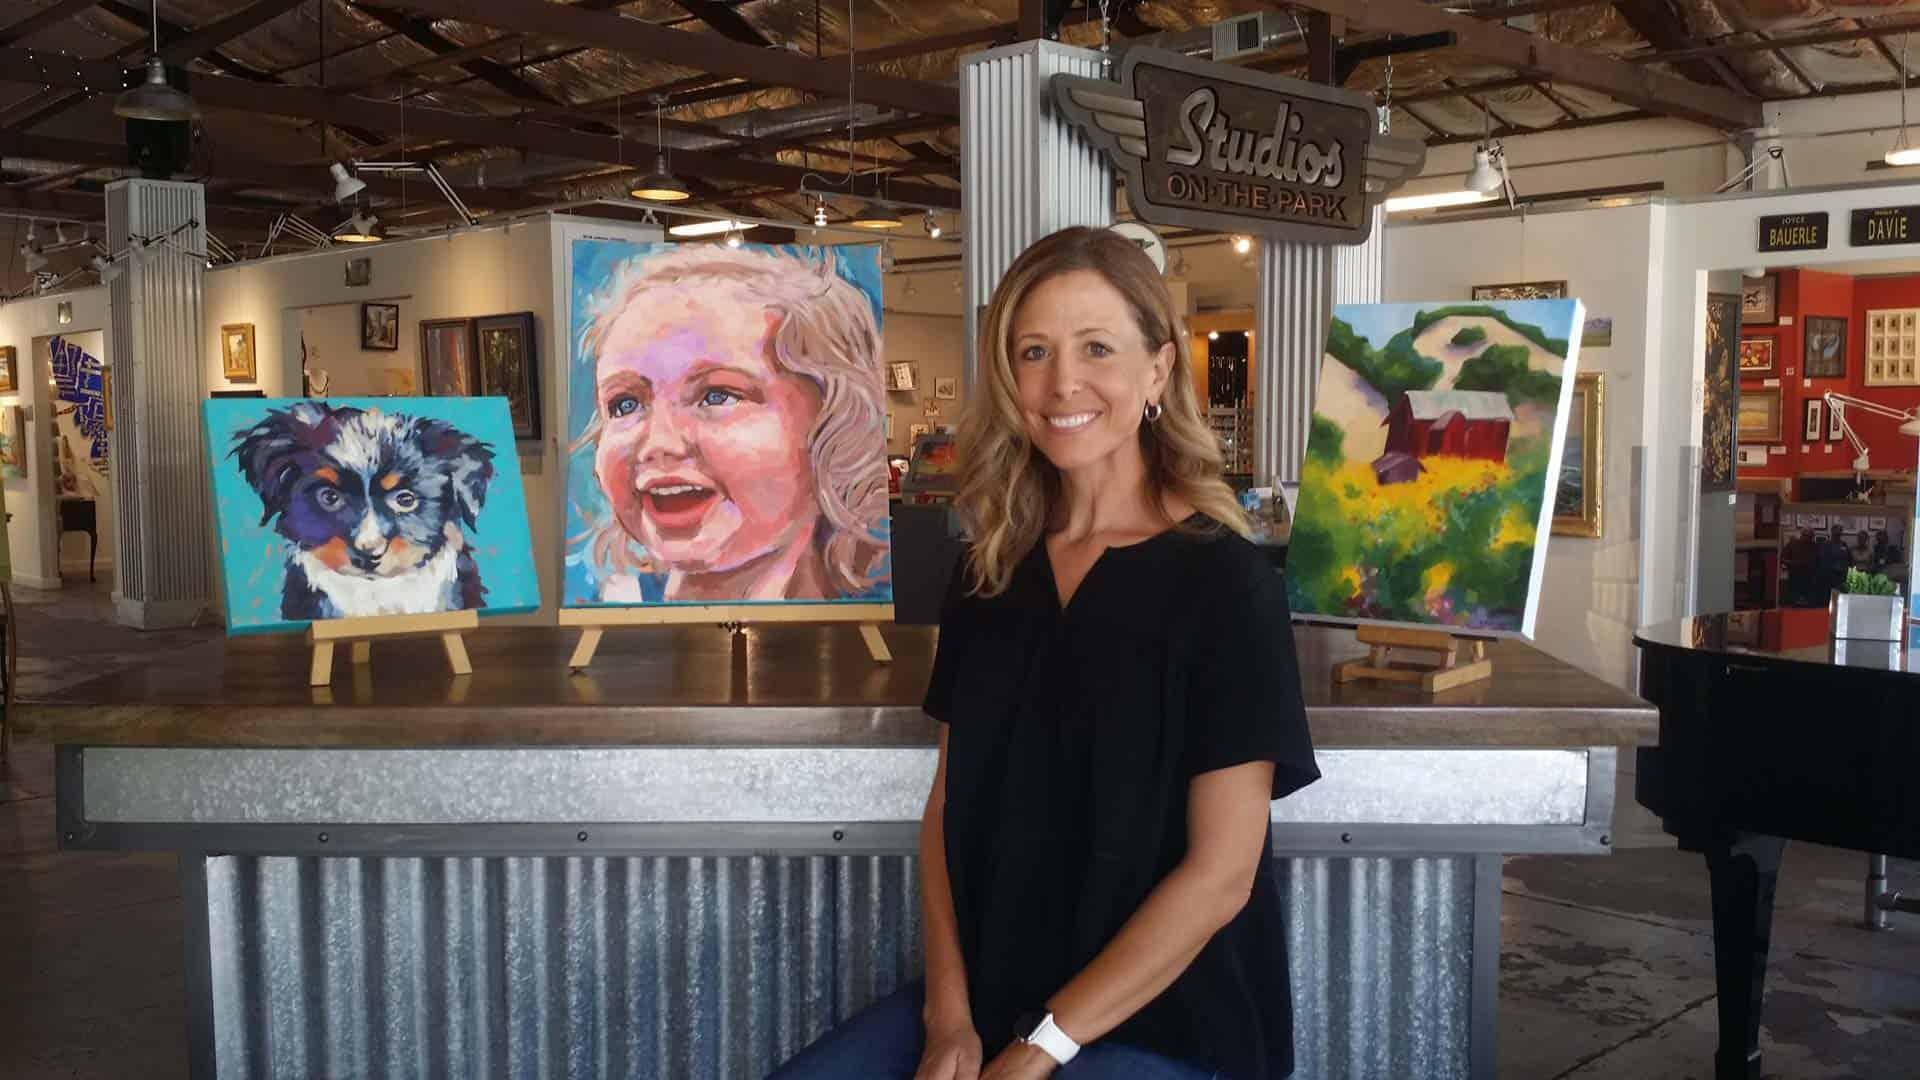 Karyn Blaney with artwork